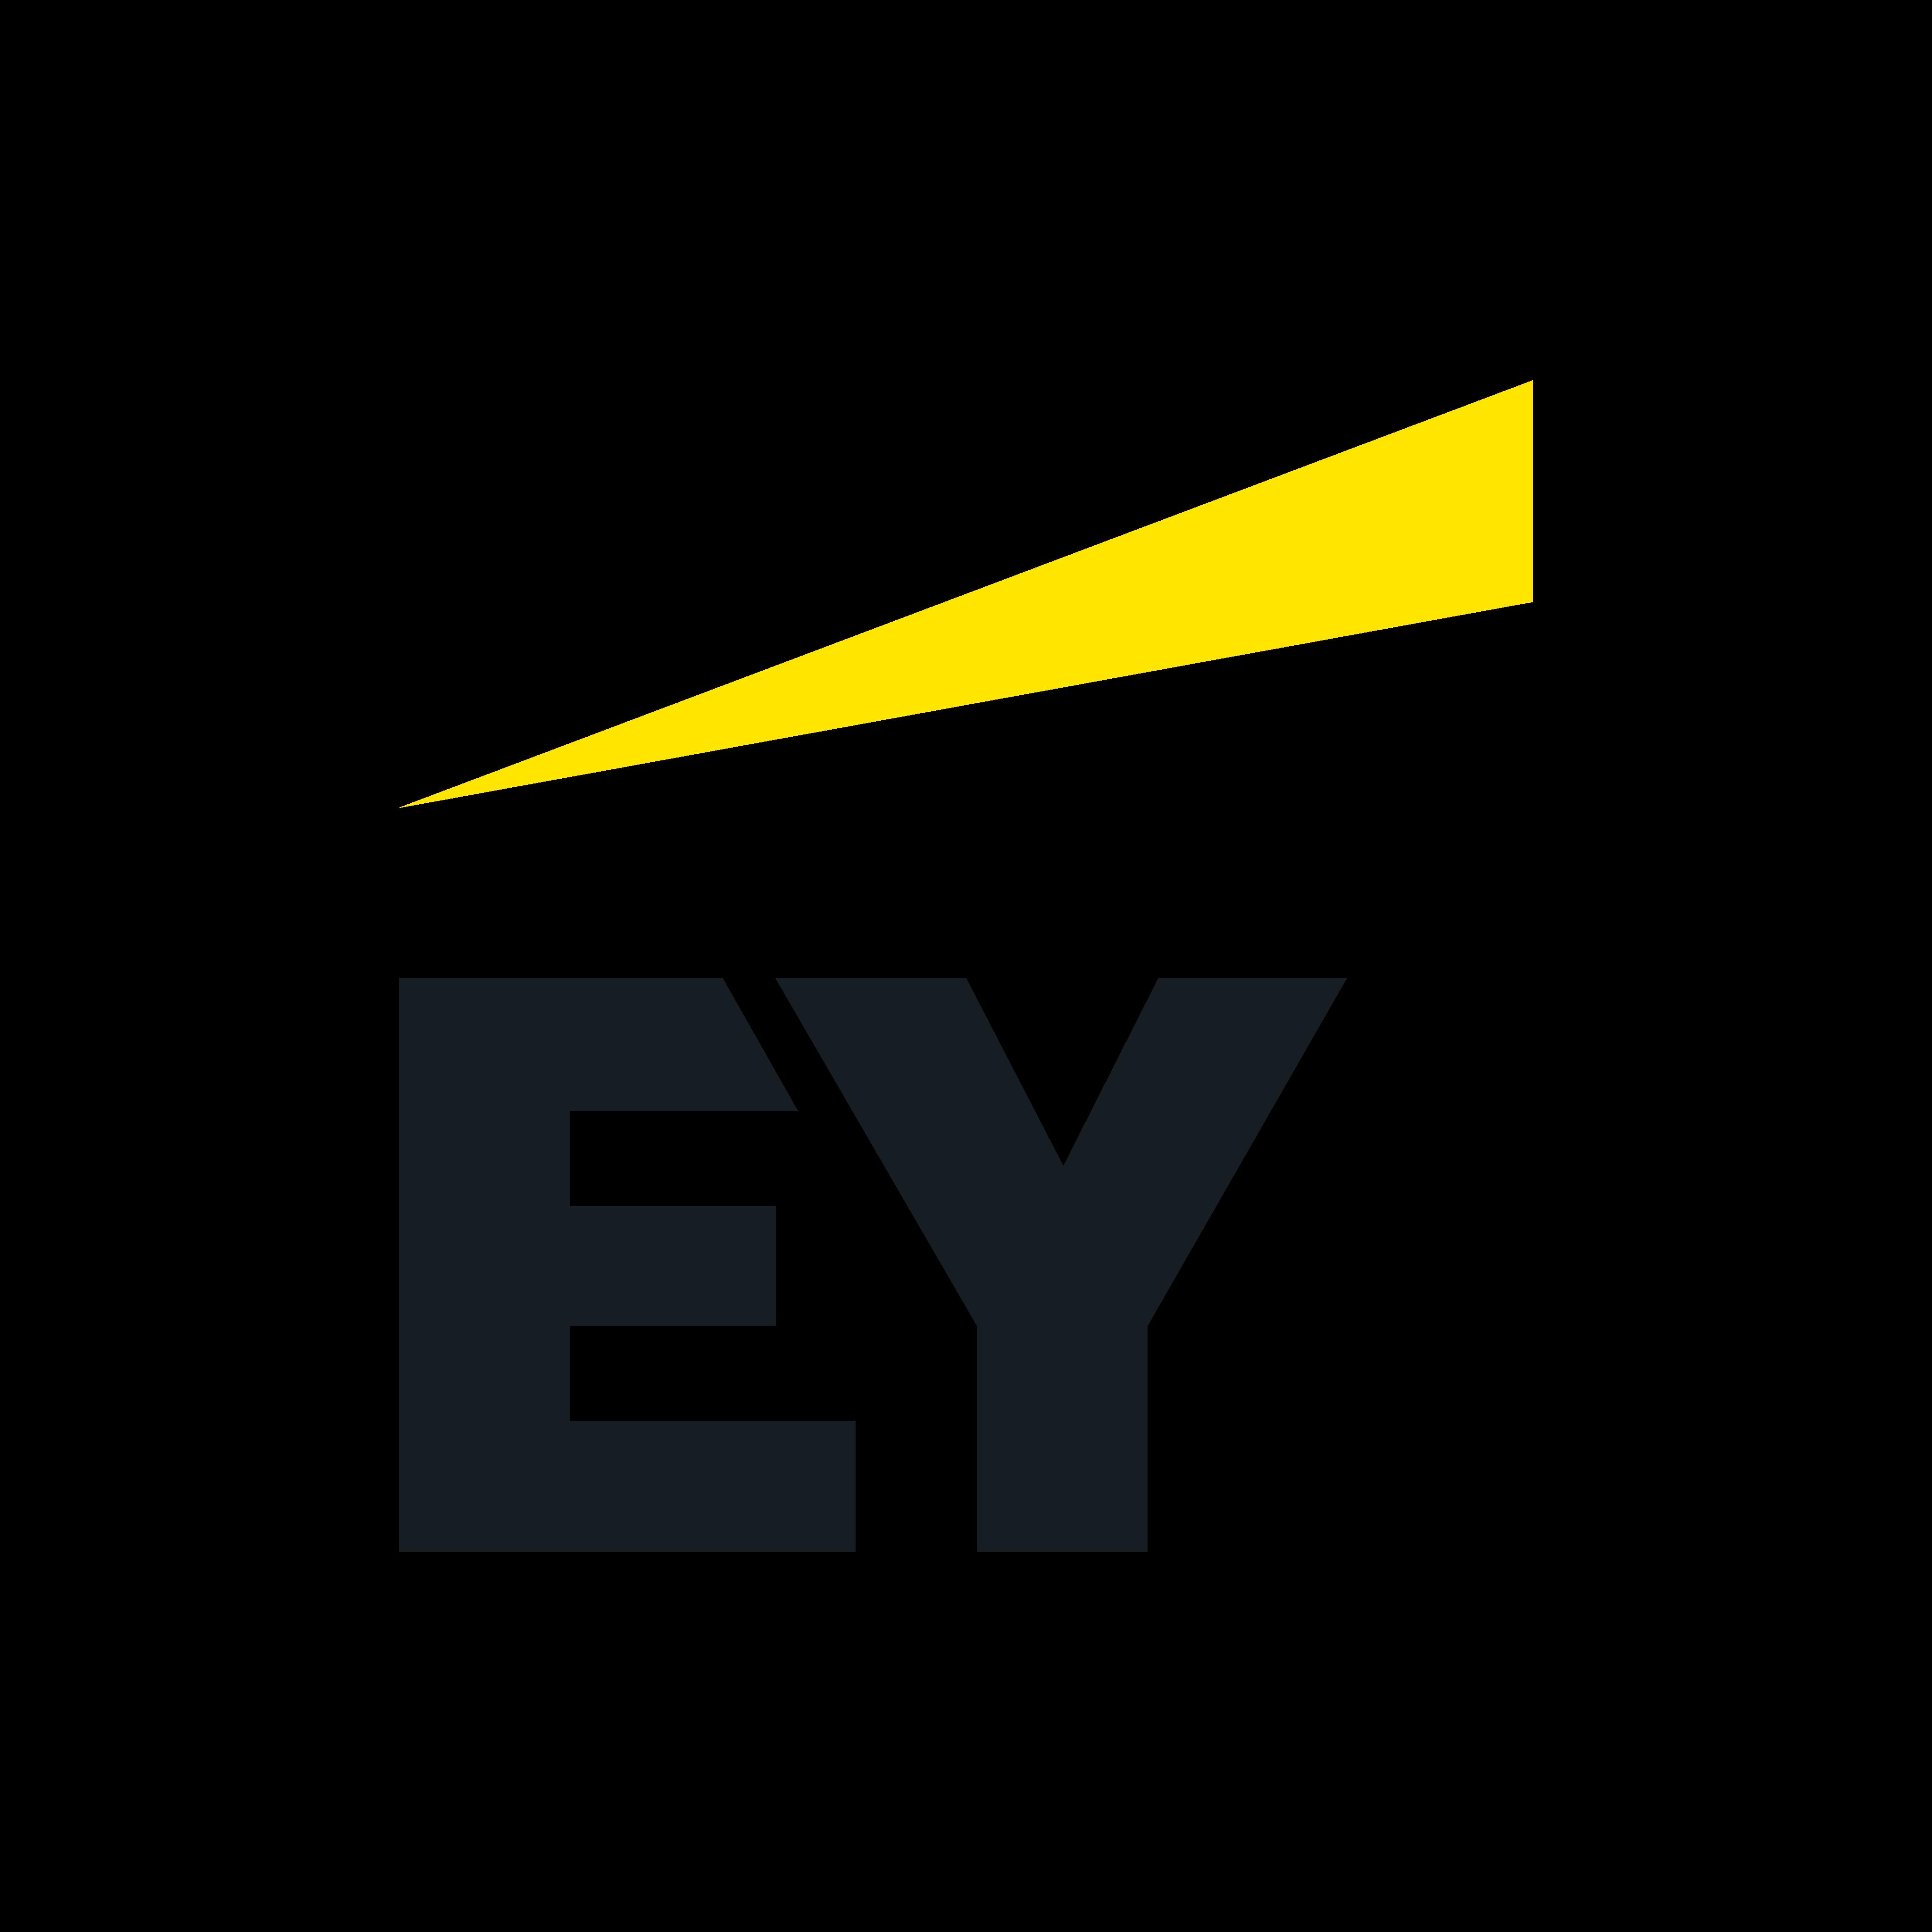 ernst young logo 0 - Ernst & Young Logo